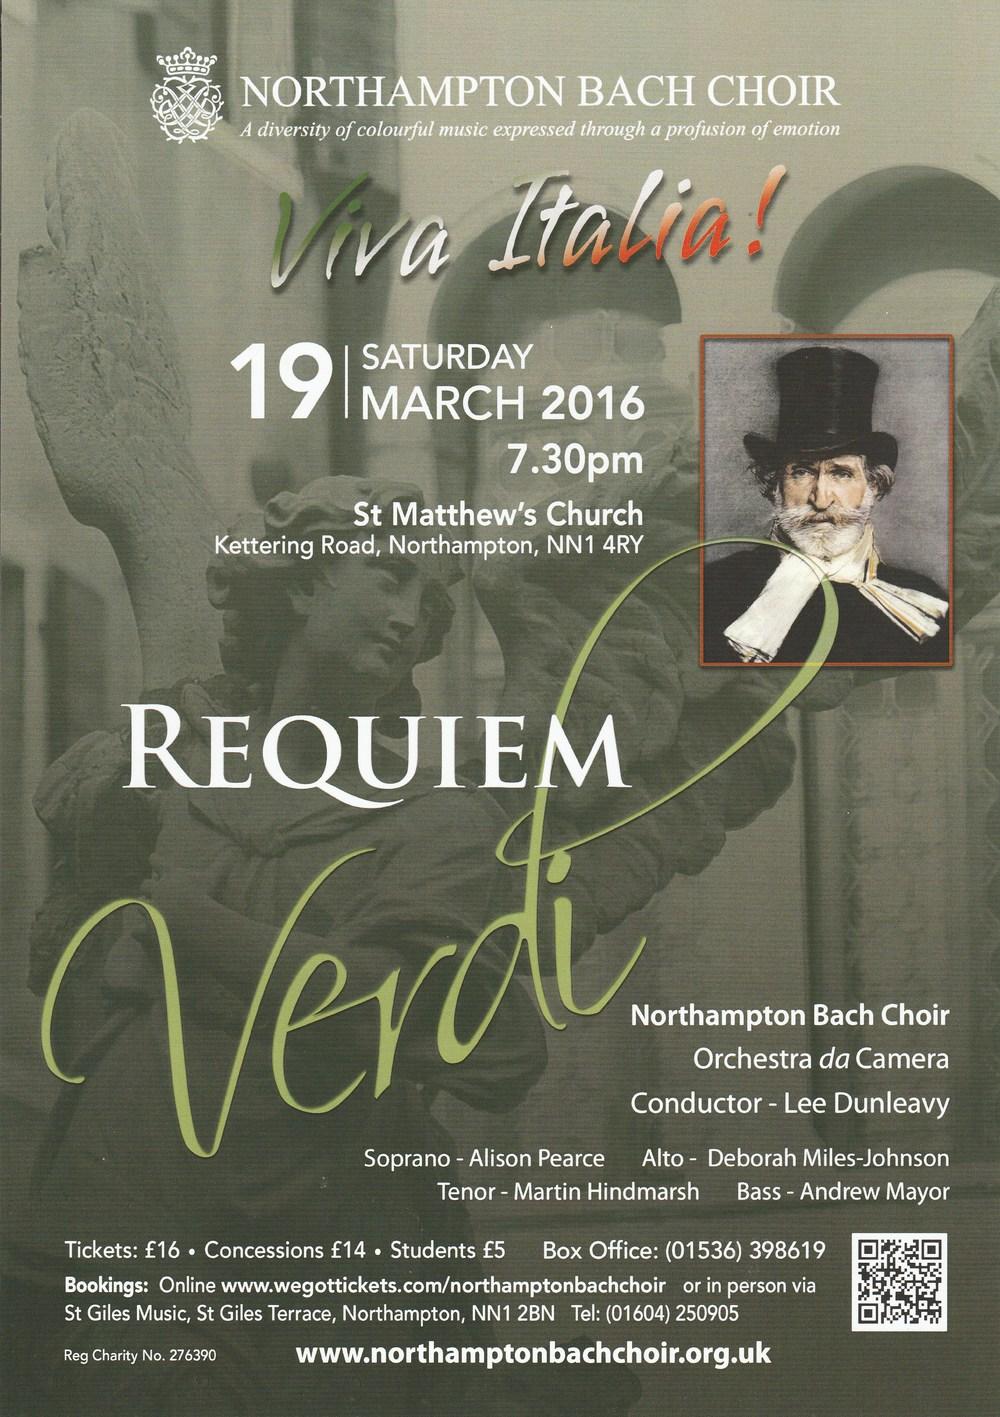 Northampton_Bach_Choir_Verdi.jpg